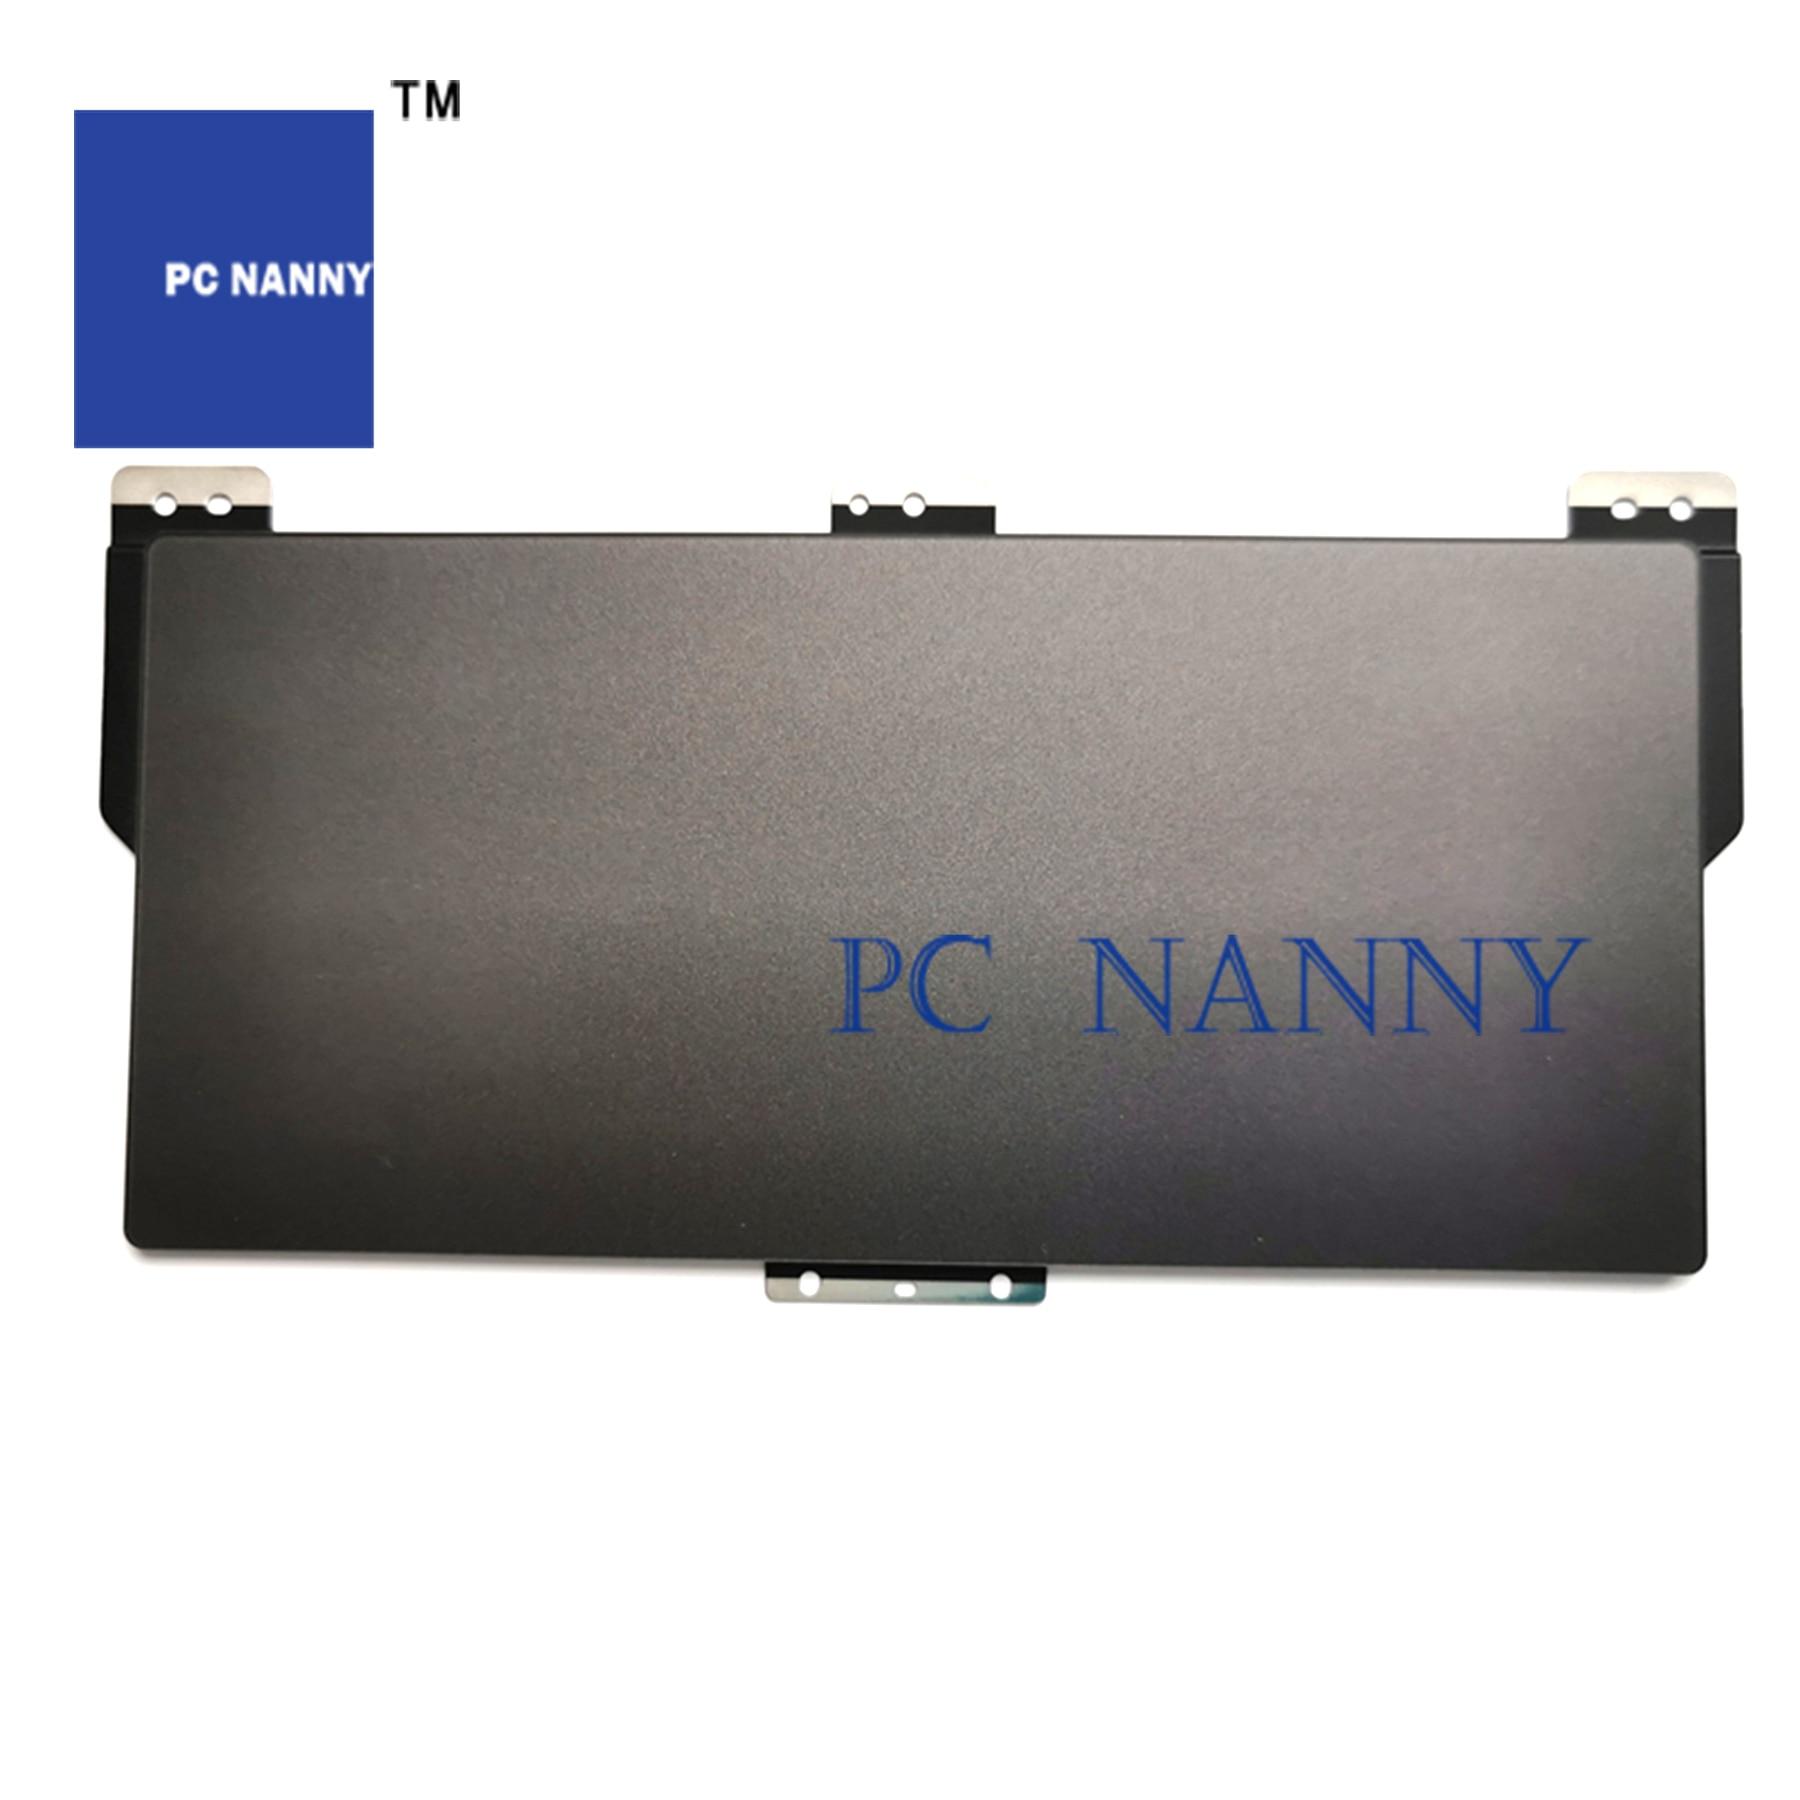 PCNANNY ل HP الحسد 15 X360 15 15-BL اللمس ماوس زر انقر سادة TM3270 TM-03270-001 اختبار جيدة